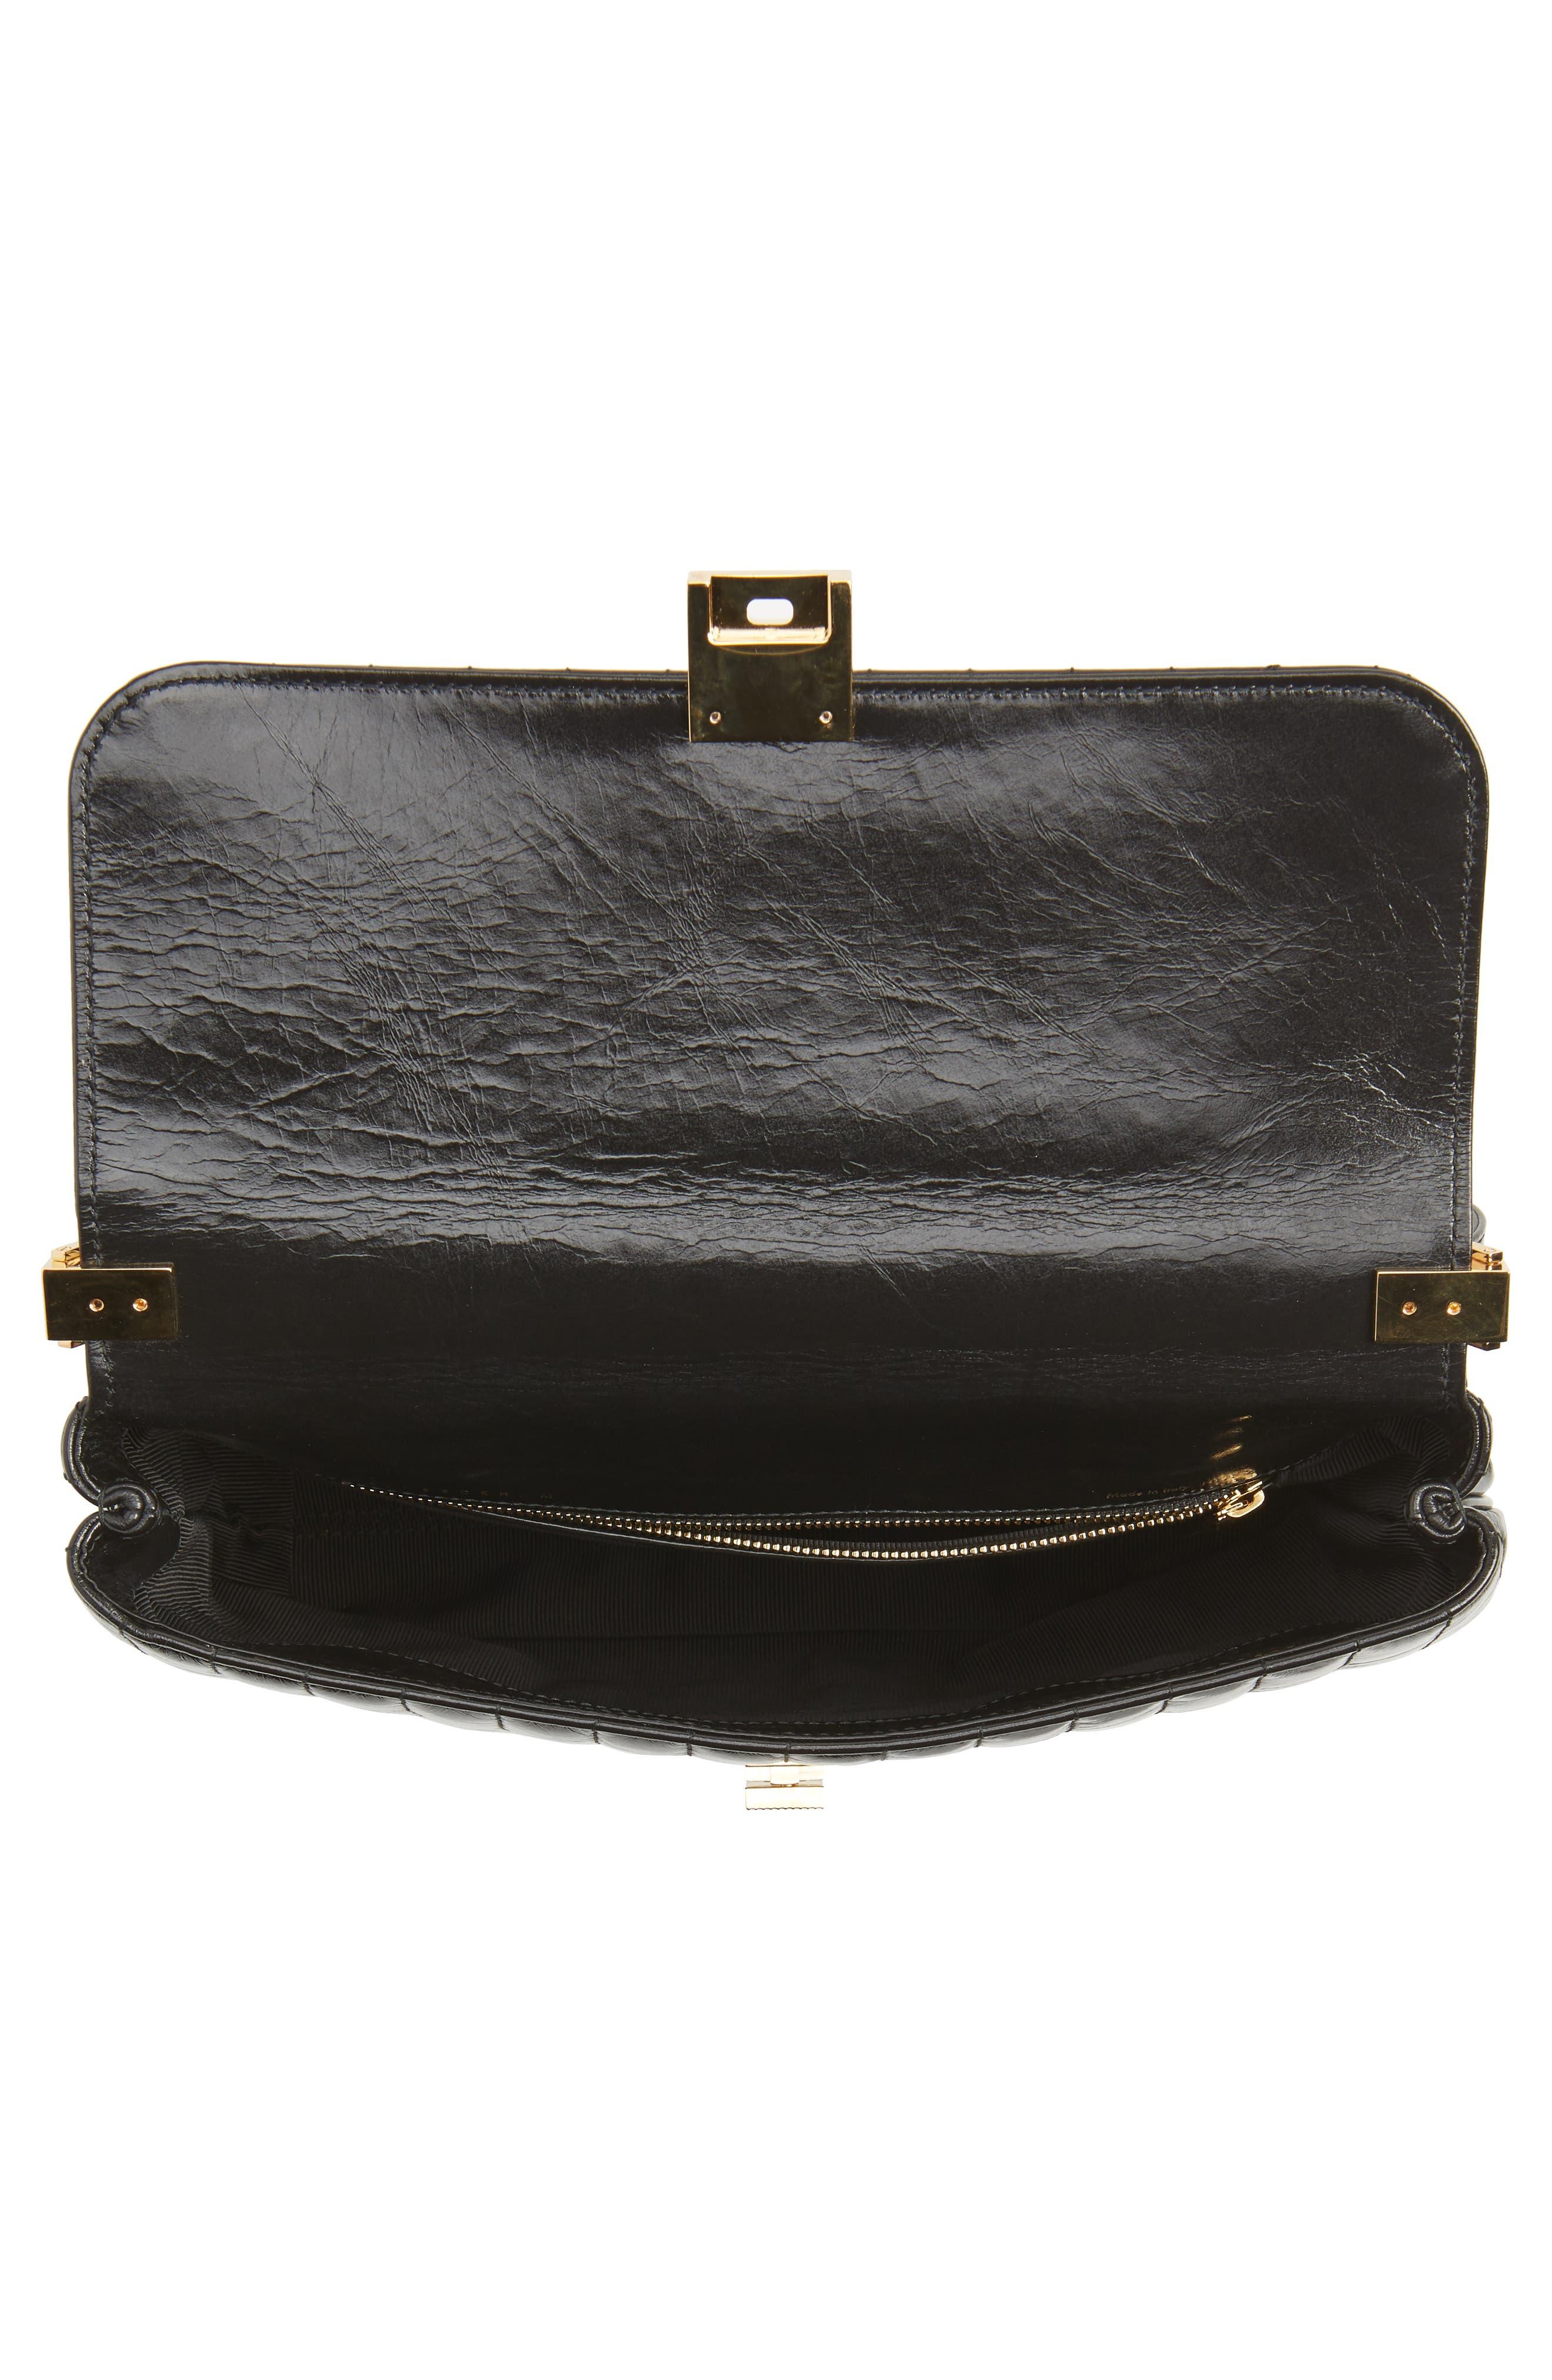 VICTORIA BECKHAM, Quinton Quilted Leather Shoulder Bag, Alternate thumbnail 4, color, 001